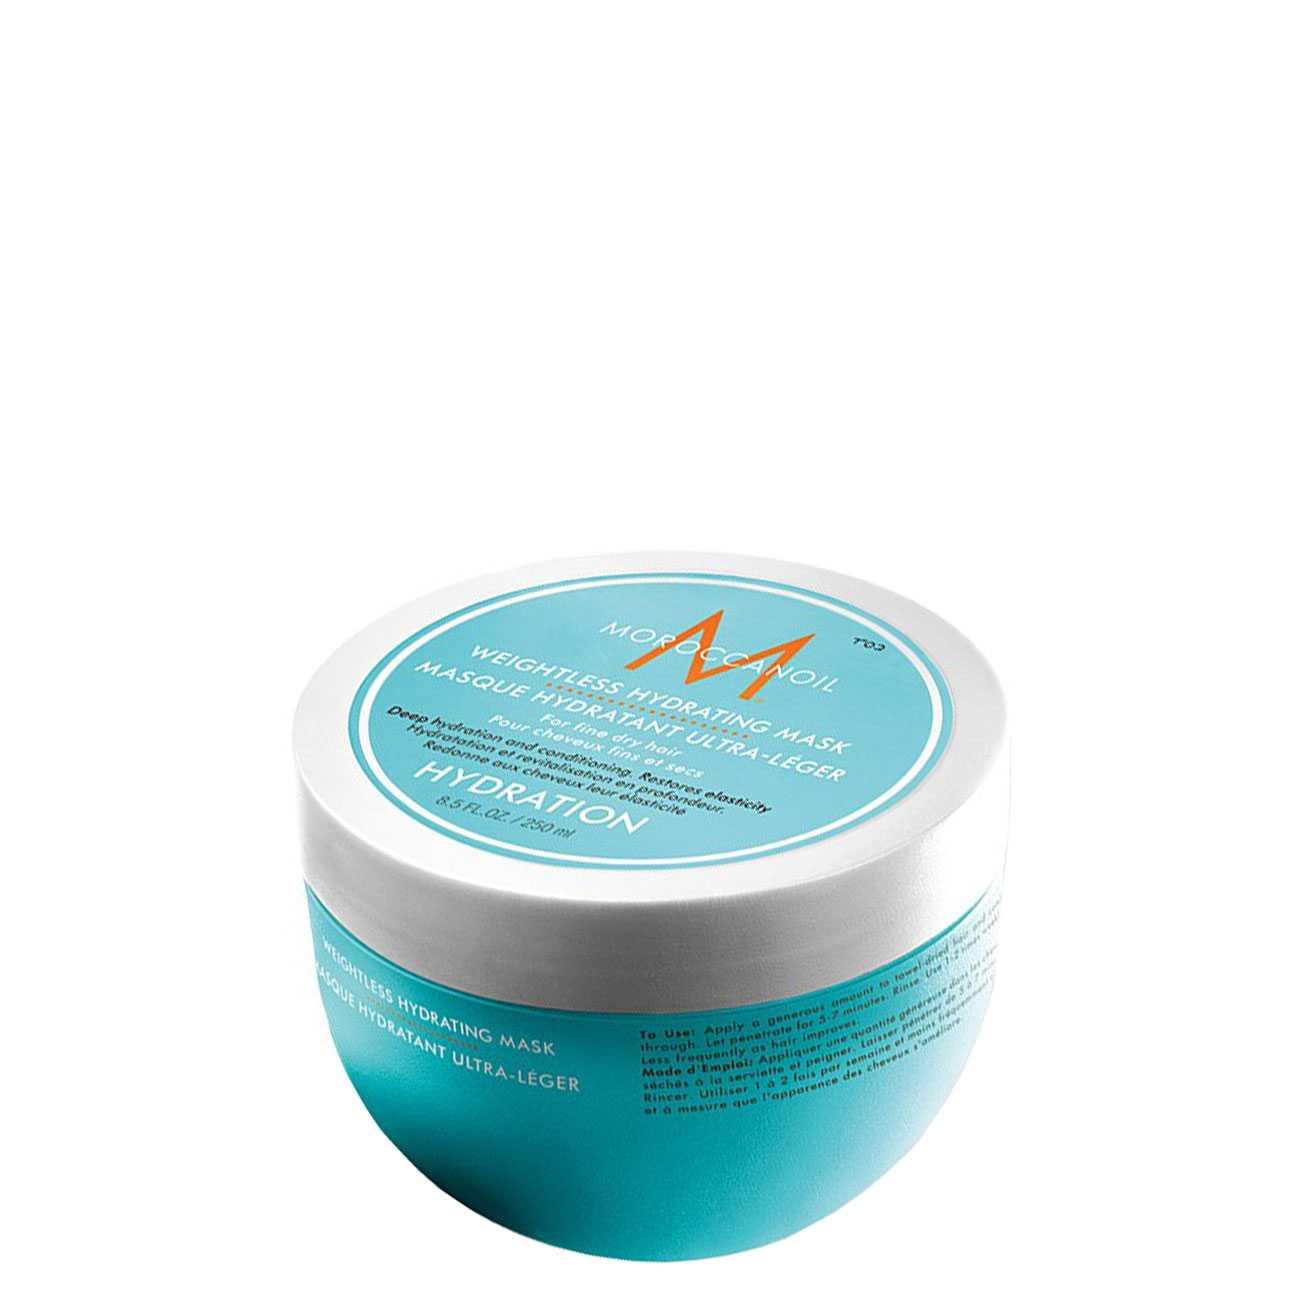 Hair Weightless Hydrating Mask 250 Ml Moroccanoil imagine 2021 bestvalue.eu